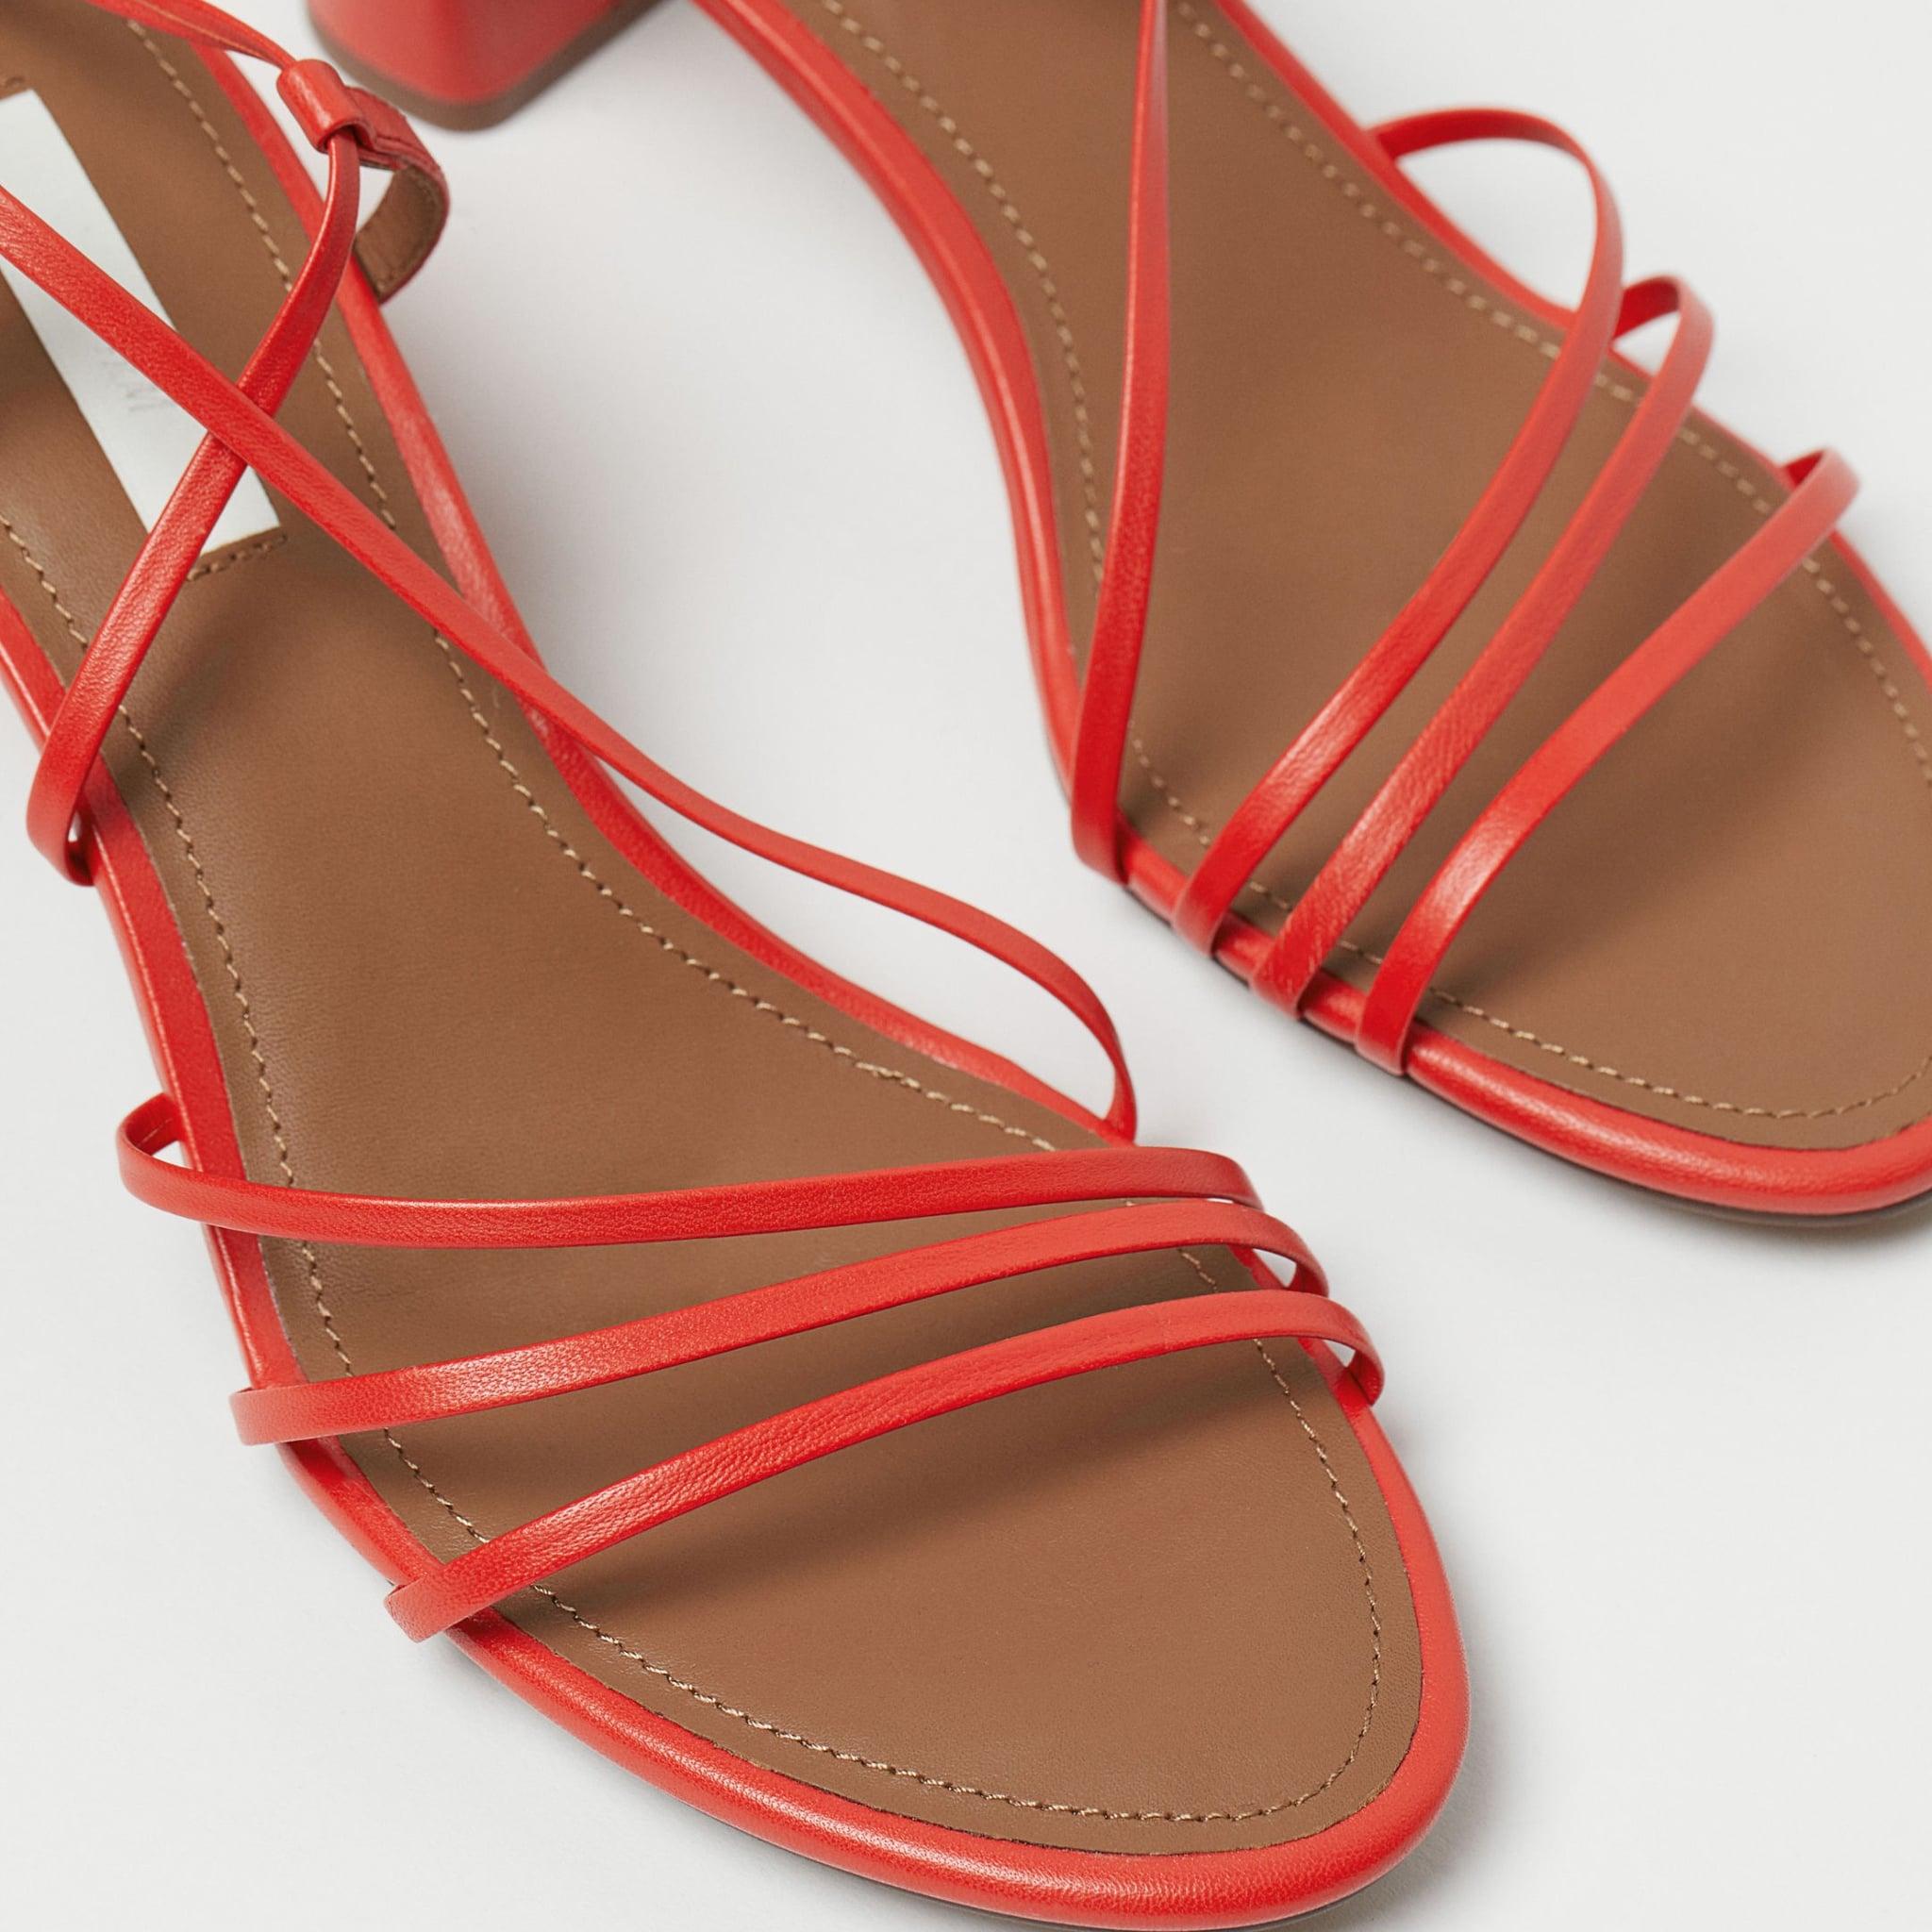 Photo 3 H amp;m Leather Fashion SandalsBest 2019 Popsugar EHYDW2e9I